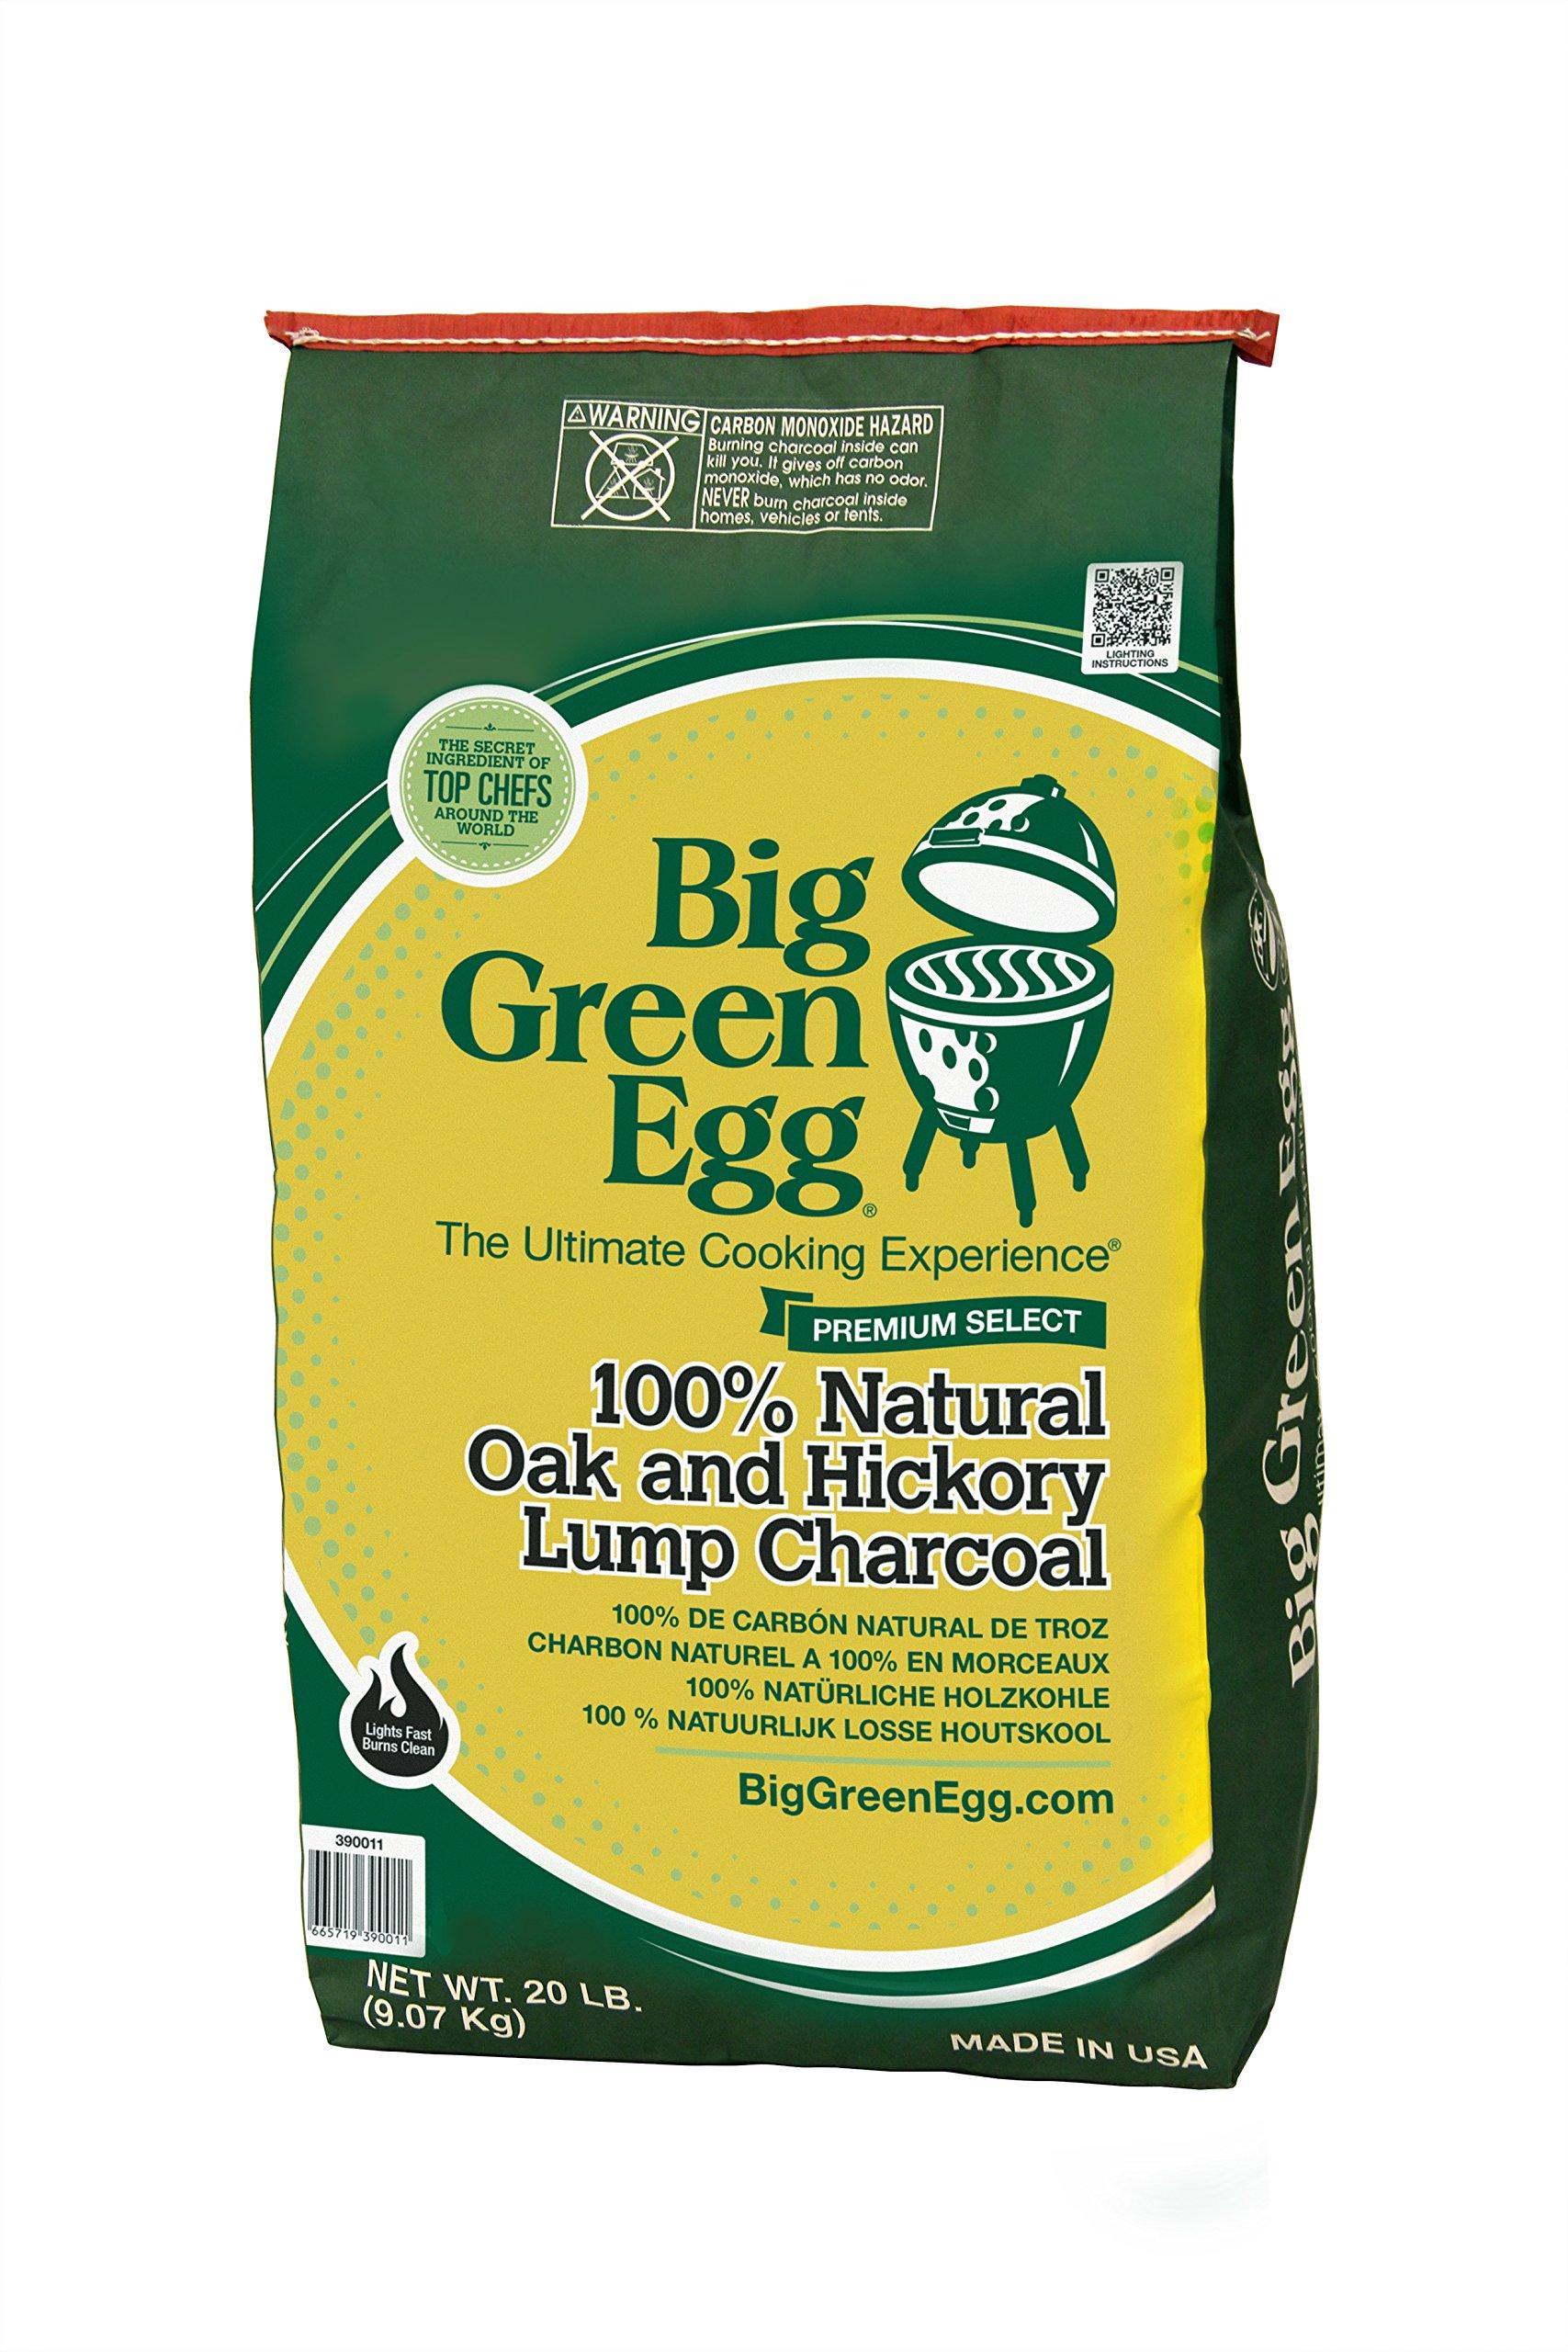 BIG CP 20-pound bag of natural lump charcoal by Big Green Egg